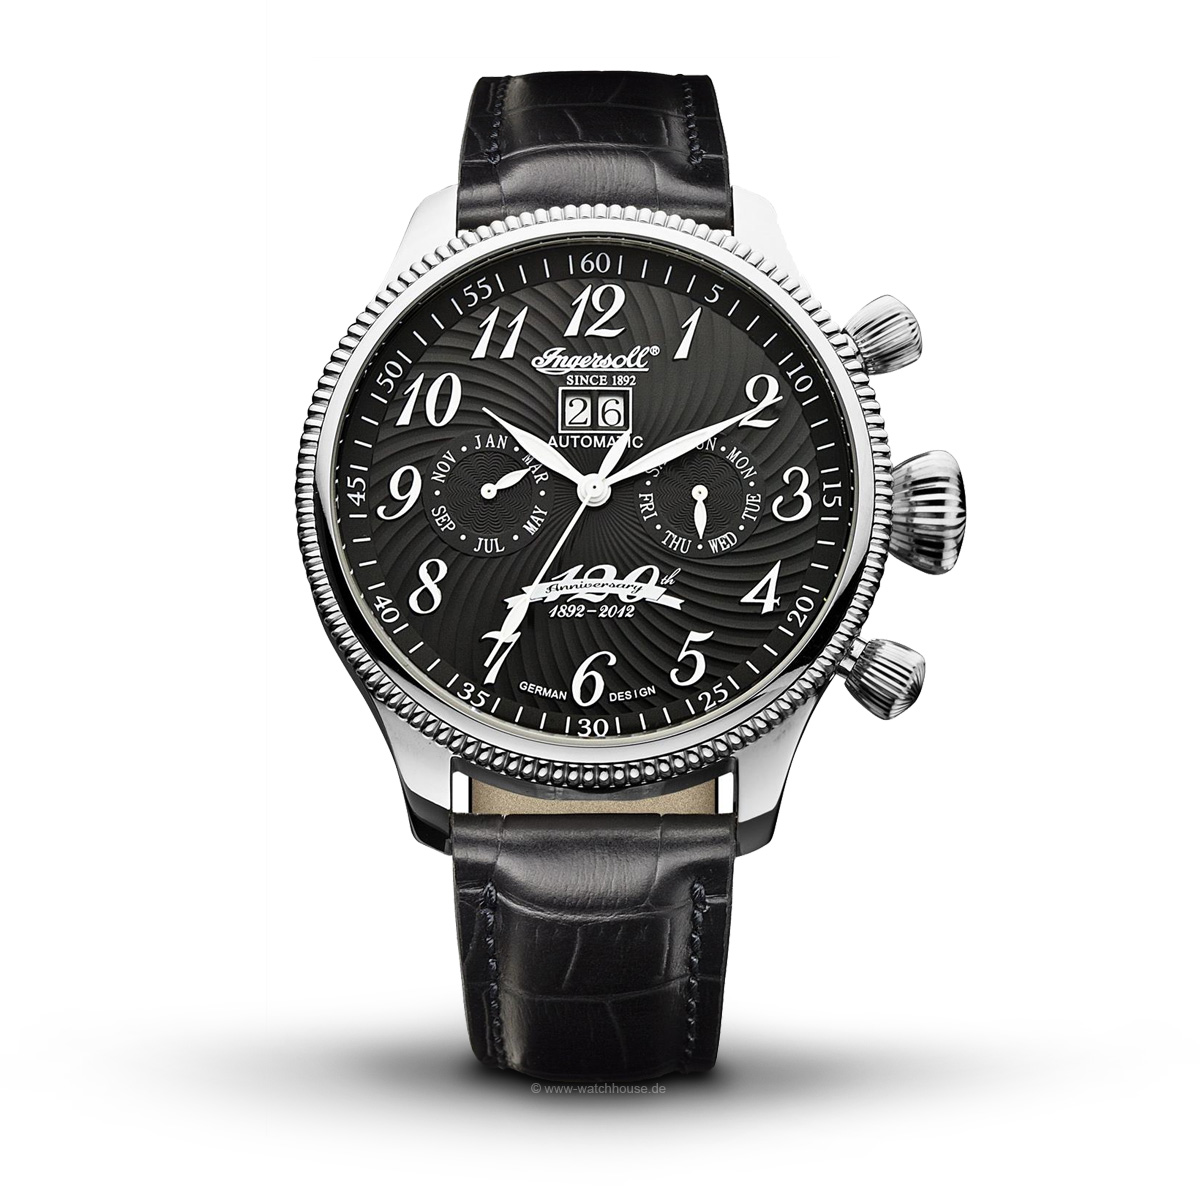 Ingersoll Independance IN3106BK Herren Armbanduhr Automatik mit Kalende